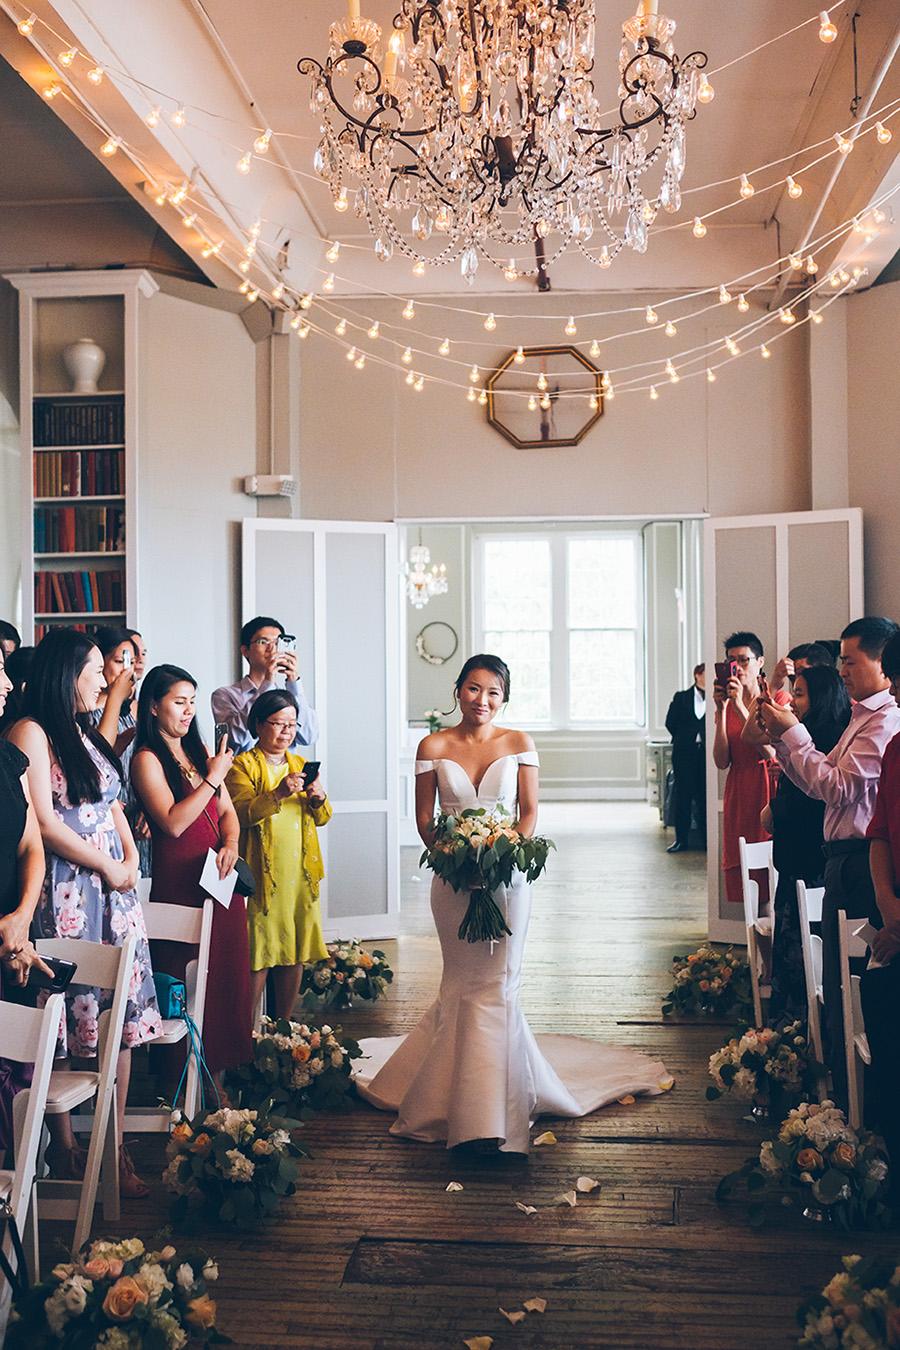 LIN-JOEY-NYC-WEDDING-METROPOLITANBUILDING-CEREMONY-CYNTHIACHUNG-0106.jpg